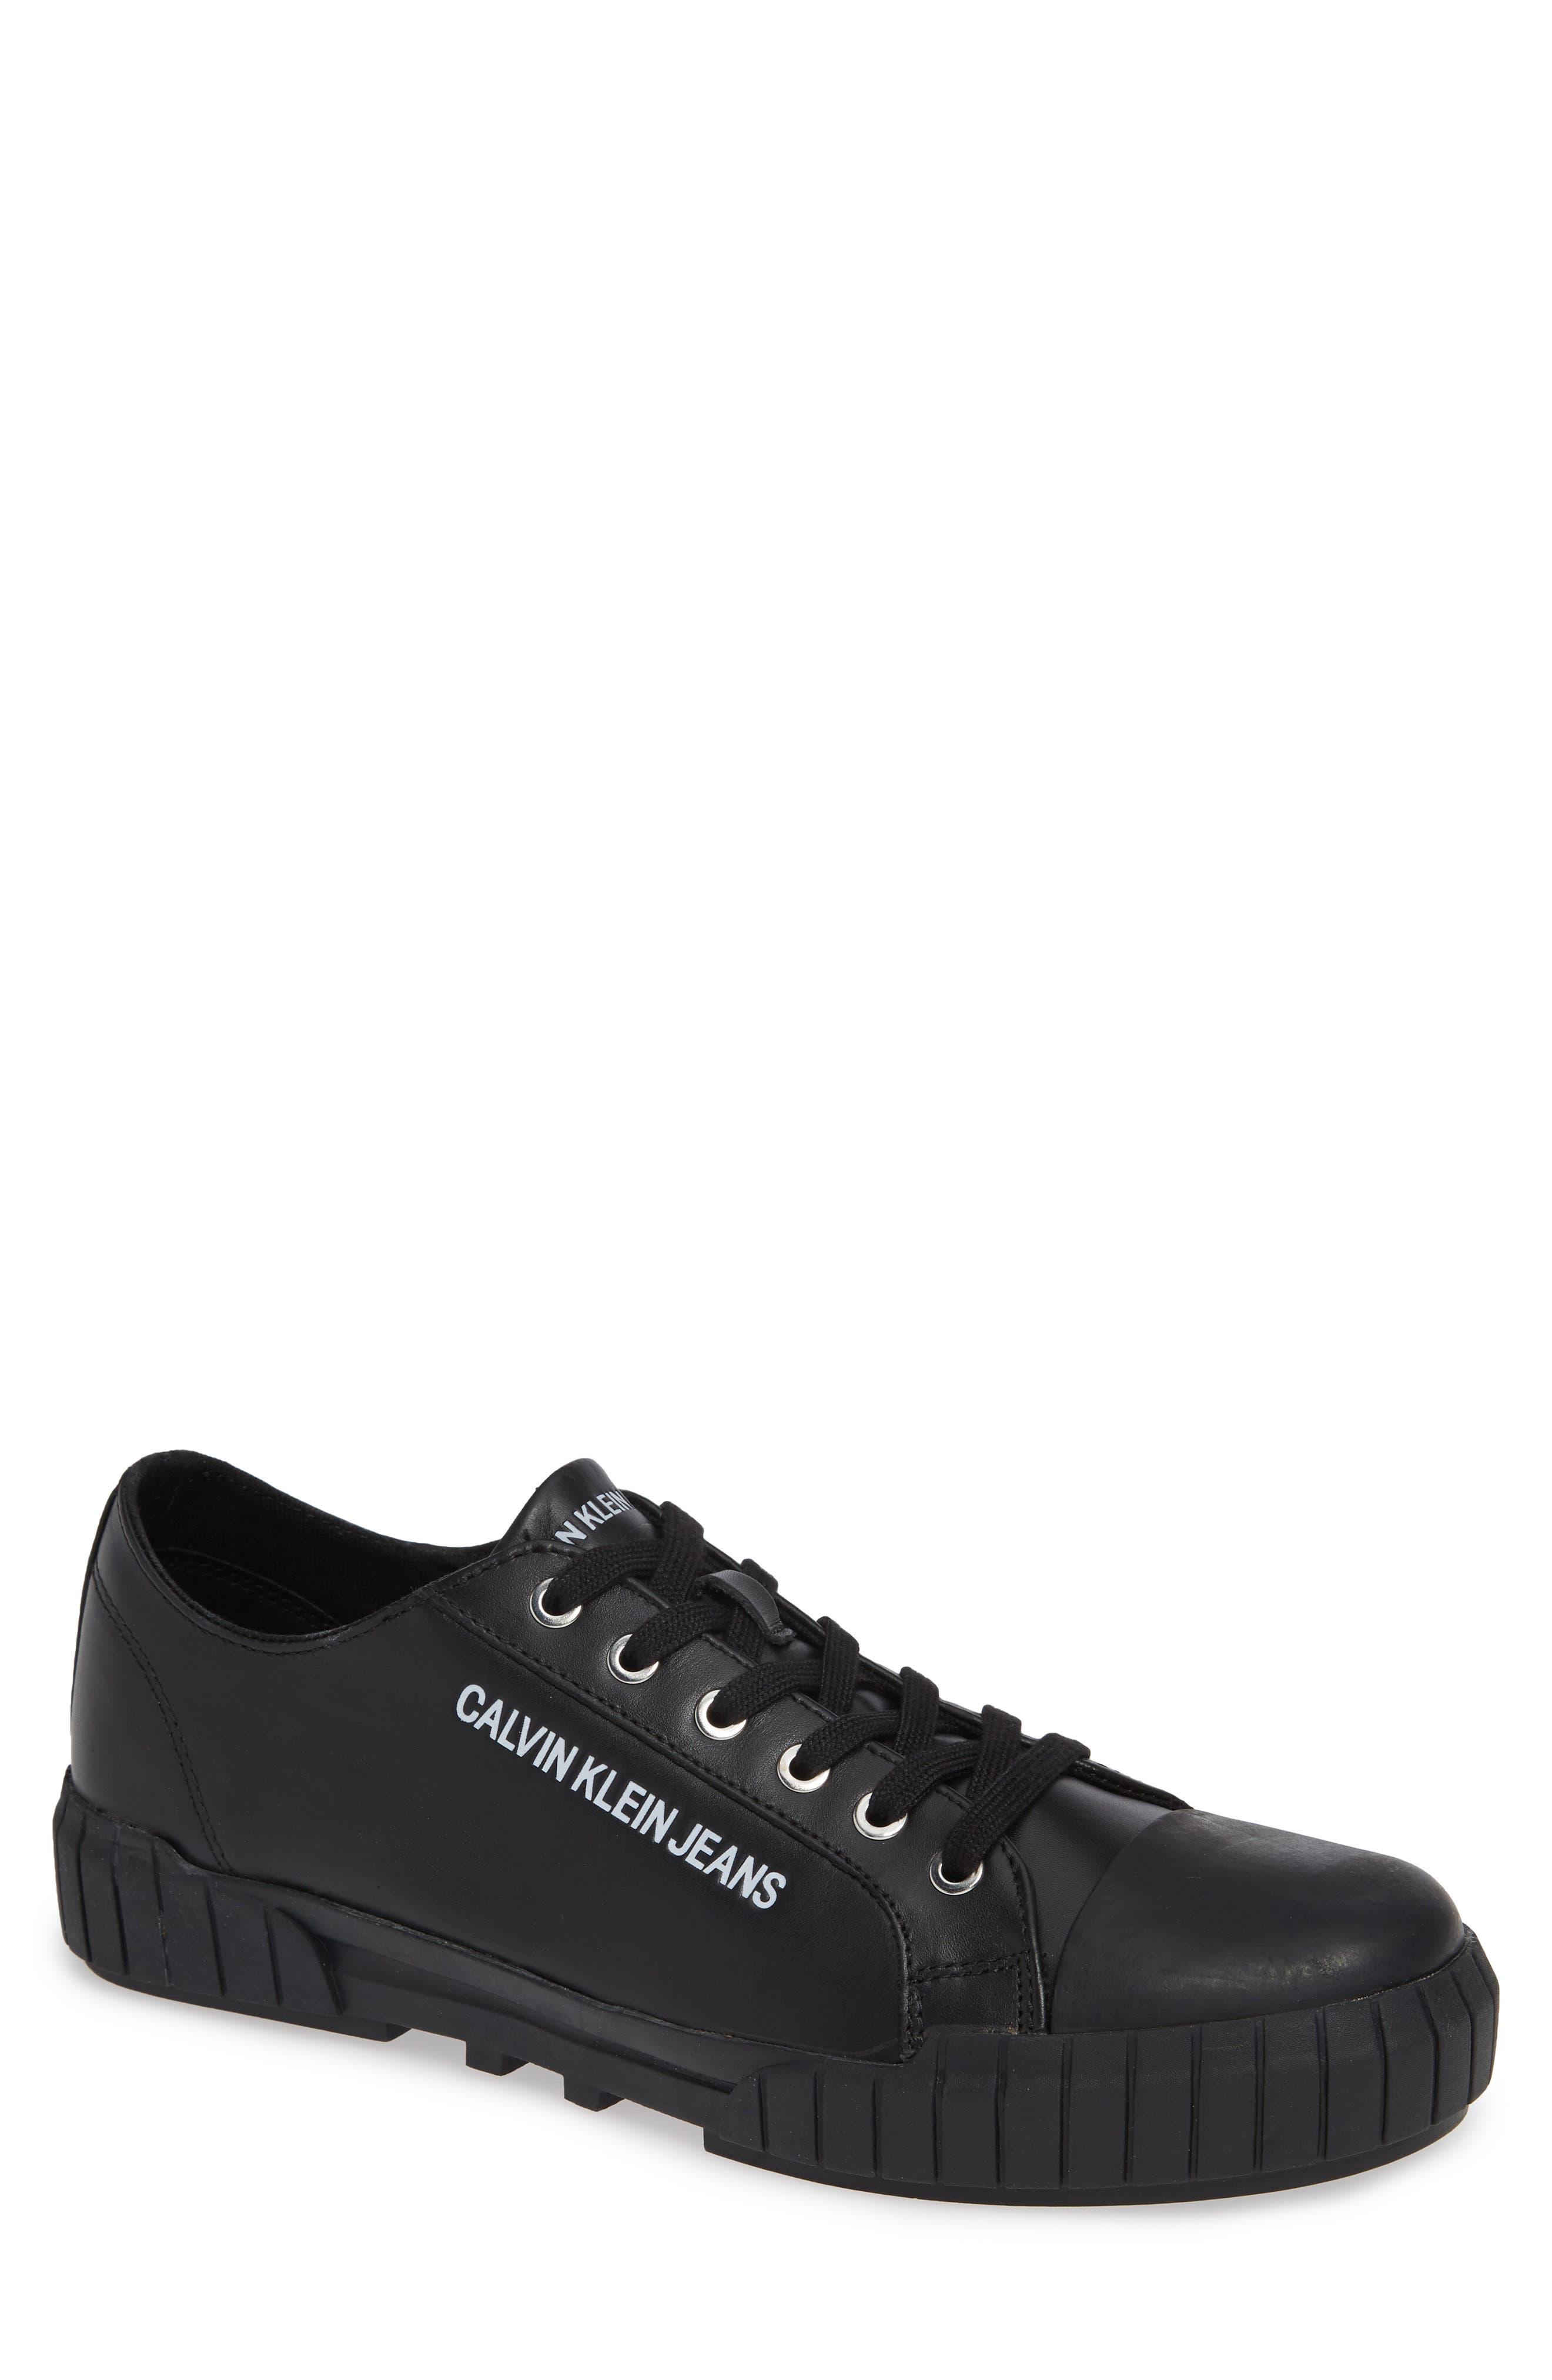 Burton Sneaker,                         Main,                         color, 001